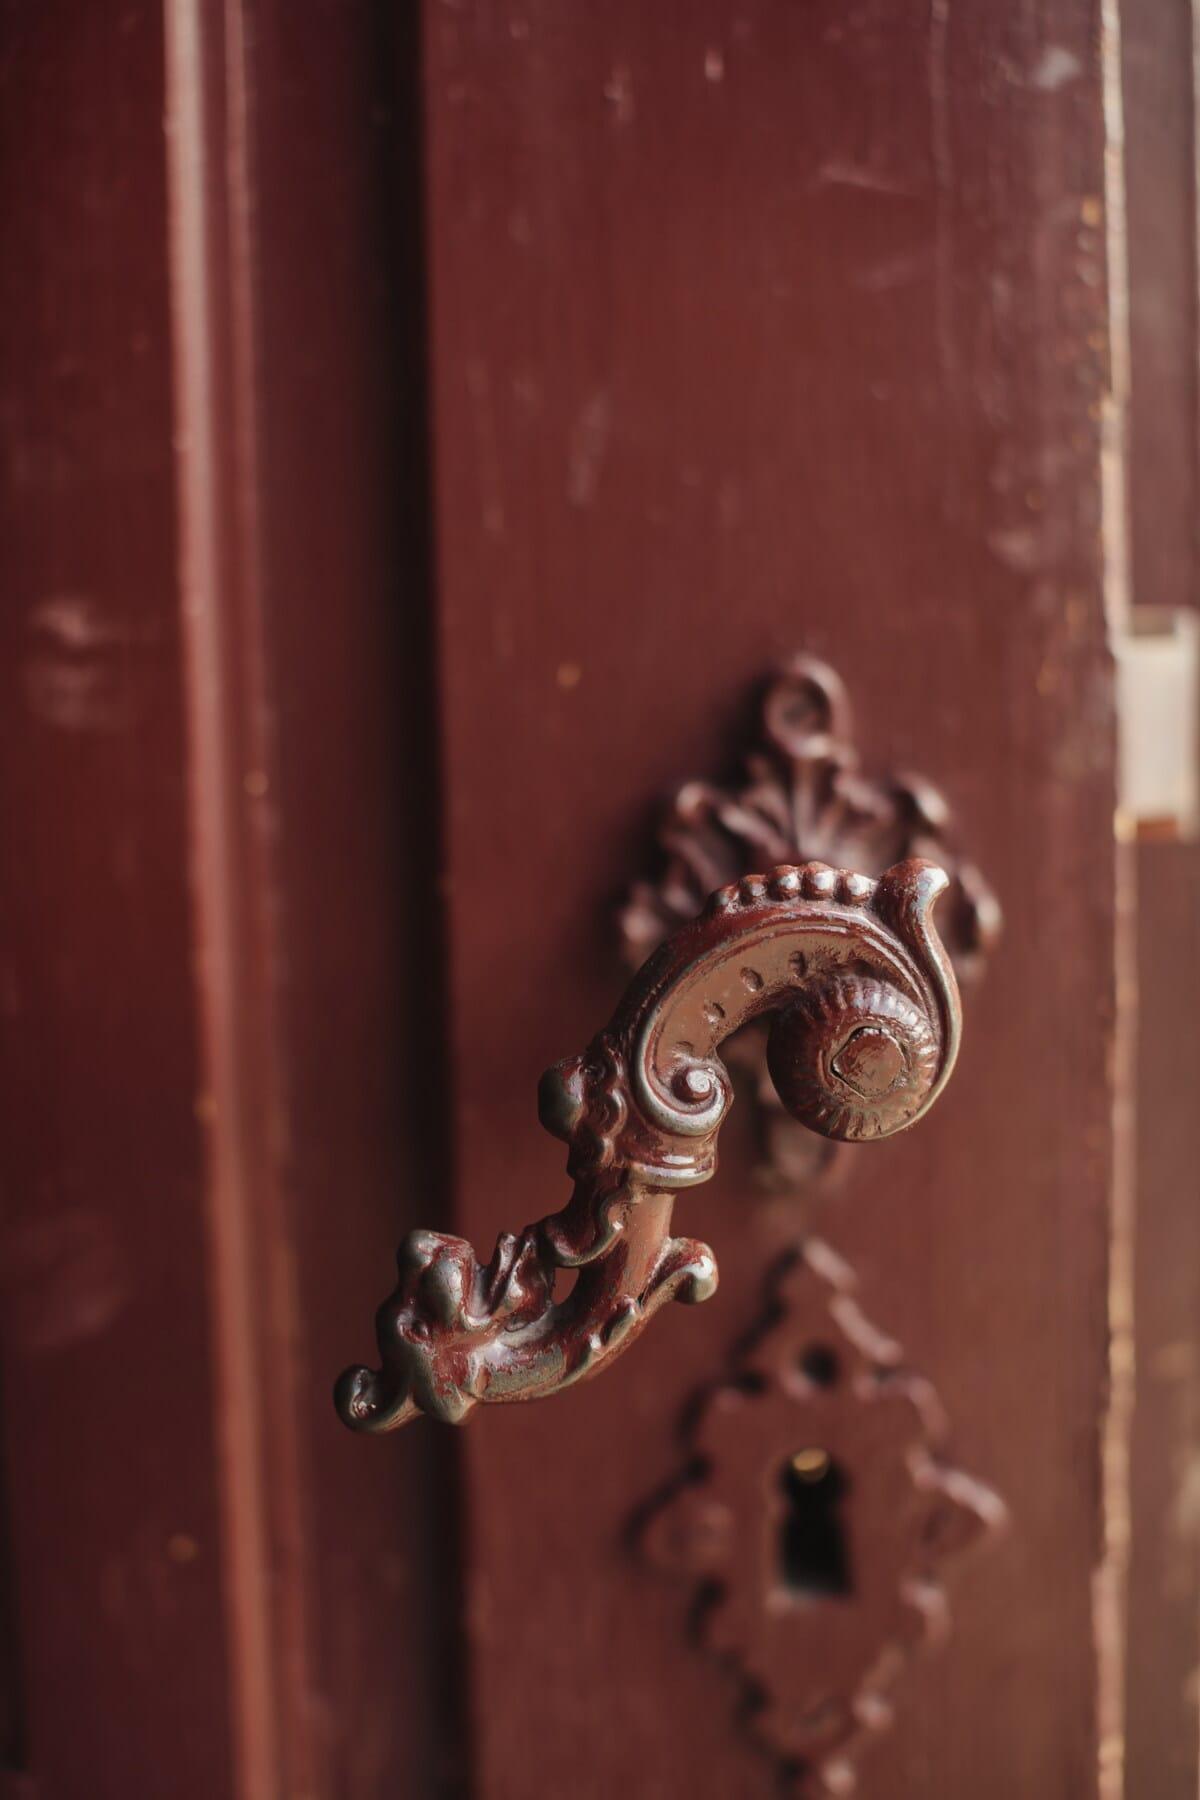 Tür, Barock, alten Stil, Verbindungselement, Tor, Riegel, Holz, Sperre, Eisen, Eingang